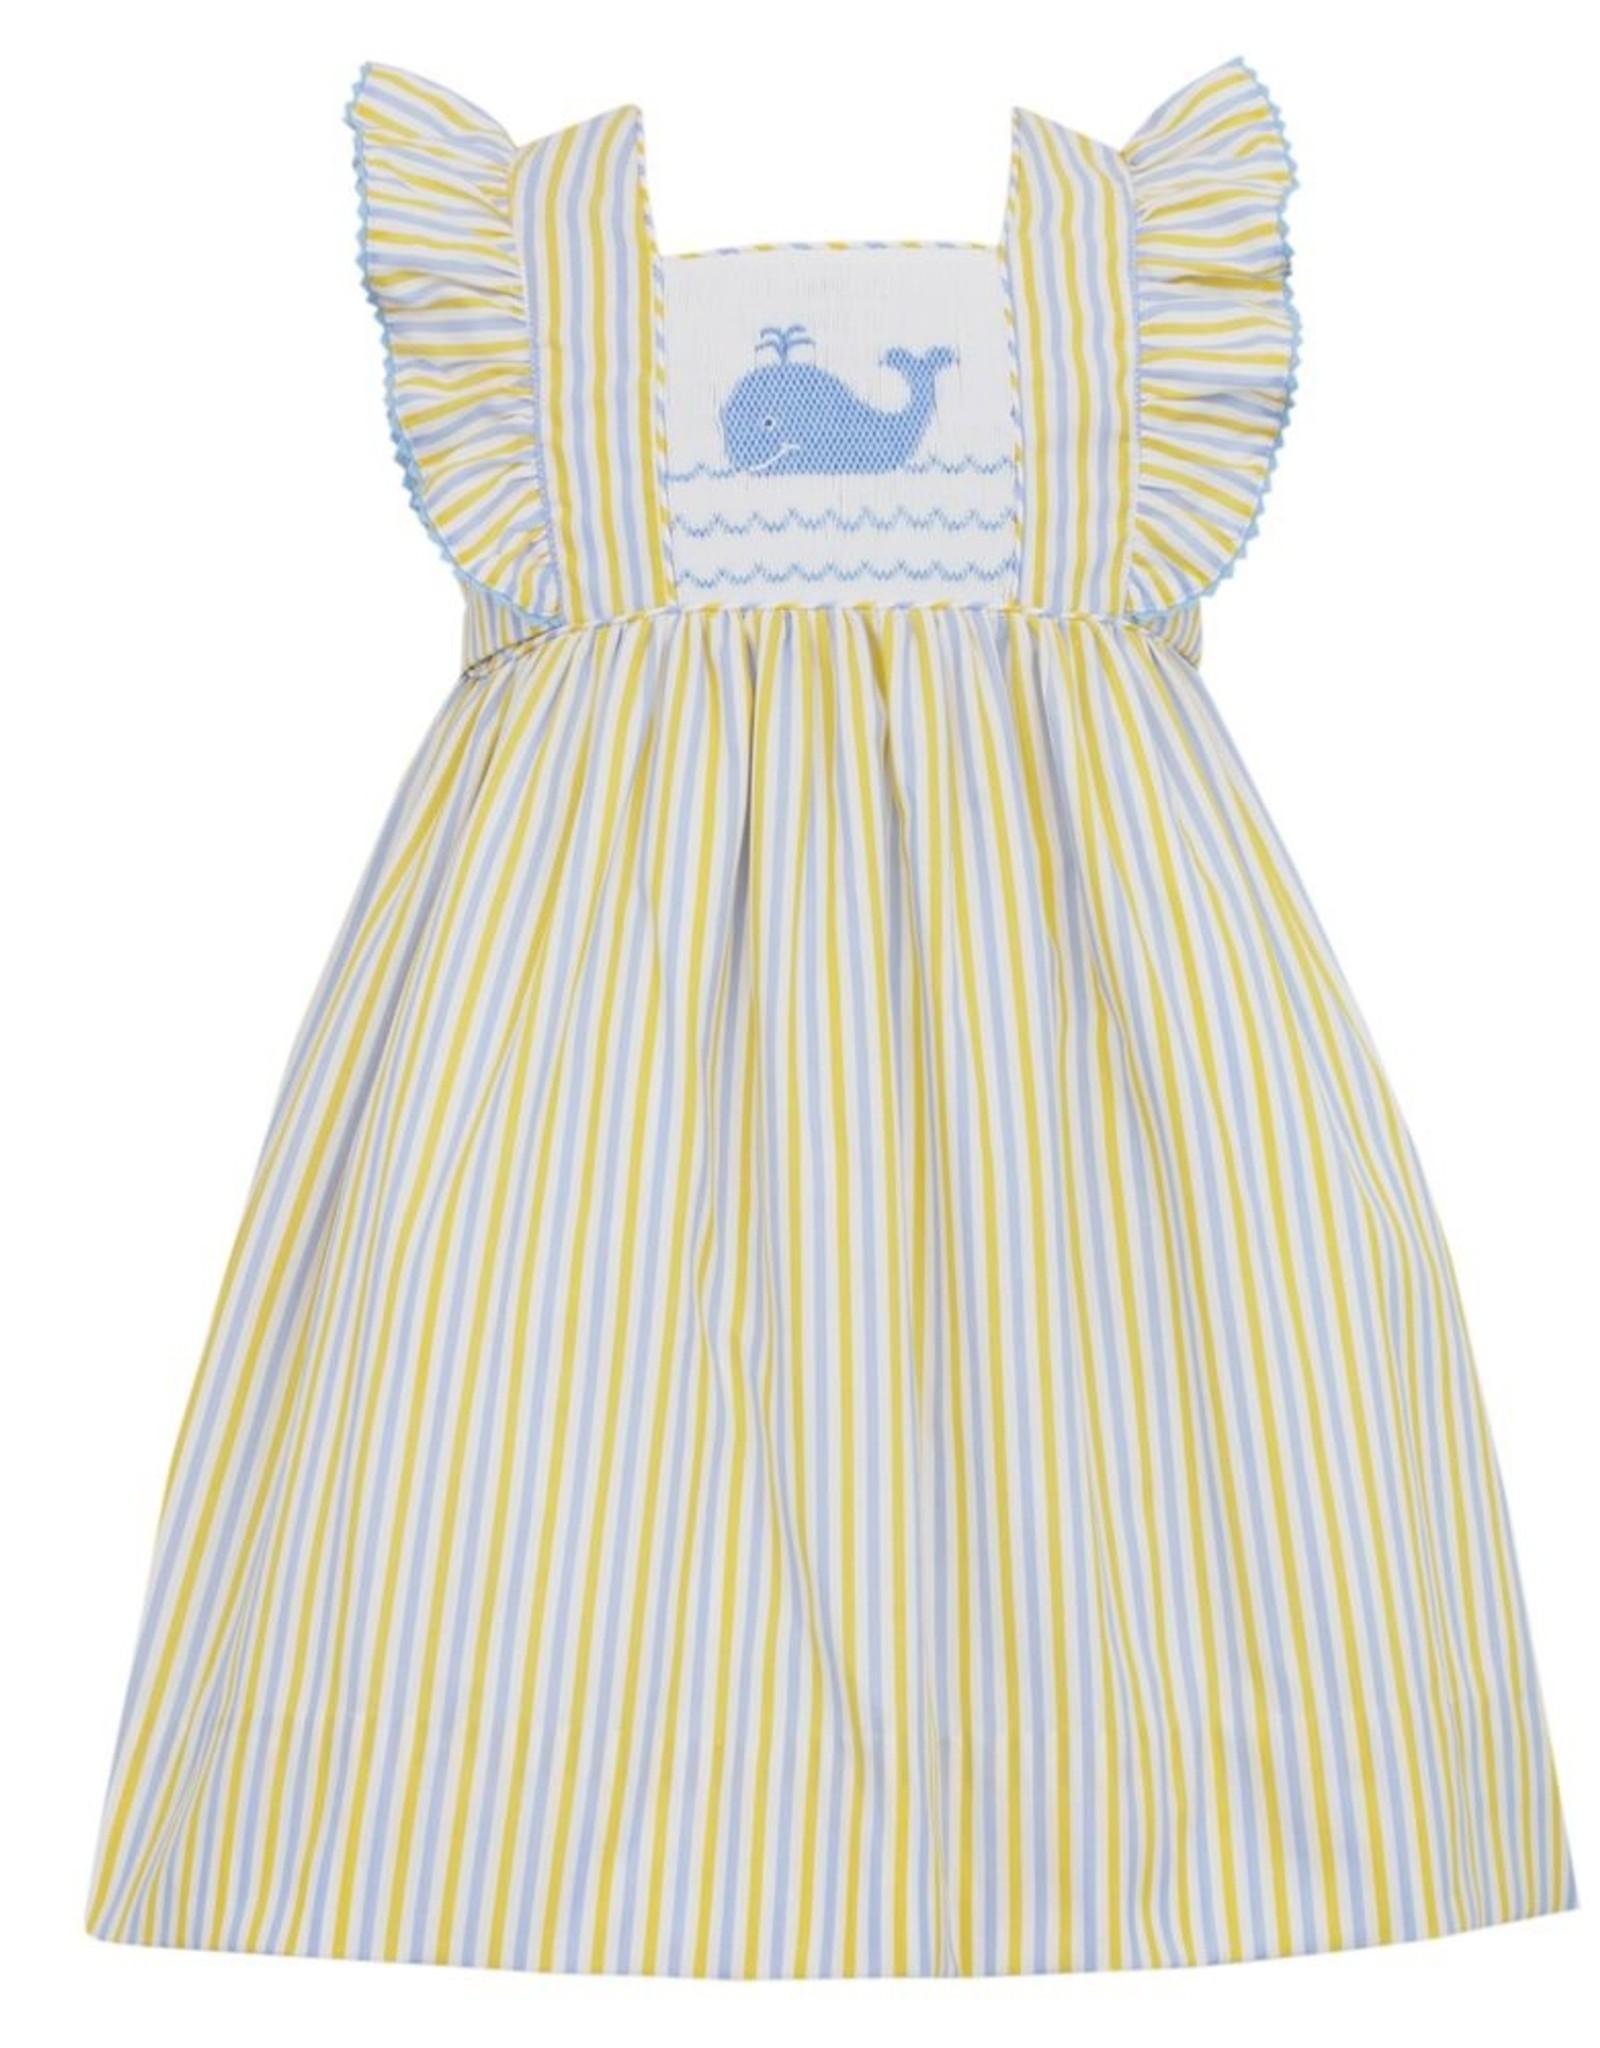 Anavini Girls Yellow / Blue Striped Smocked Whale Dress